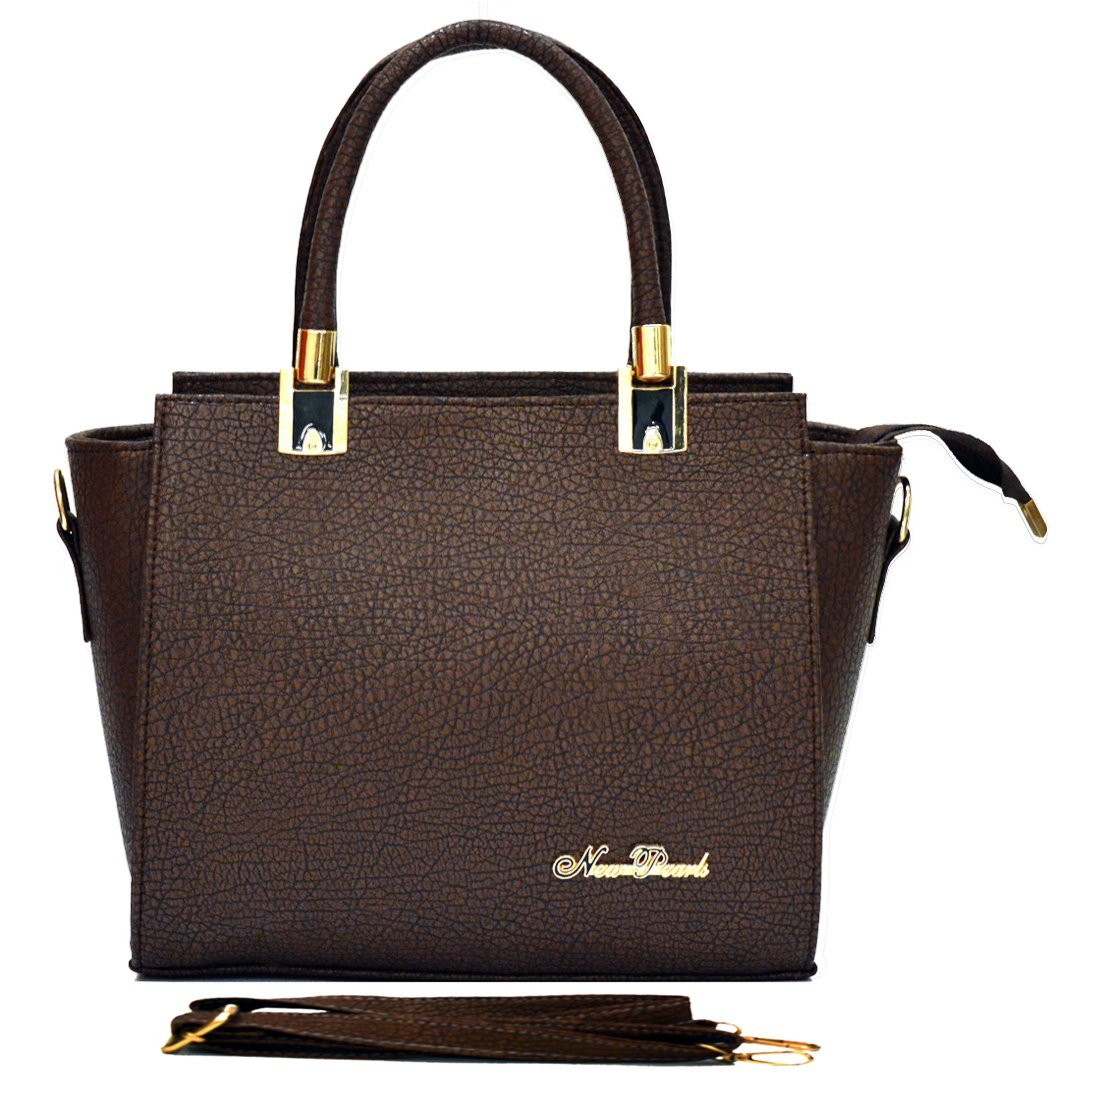 Office Handbags for Women Under 2000 in India